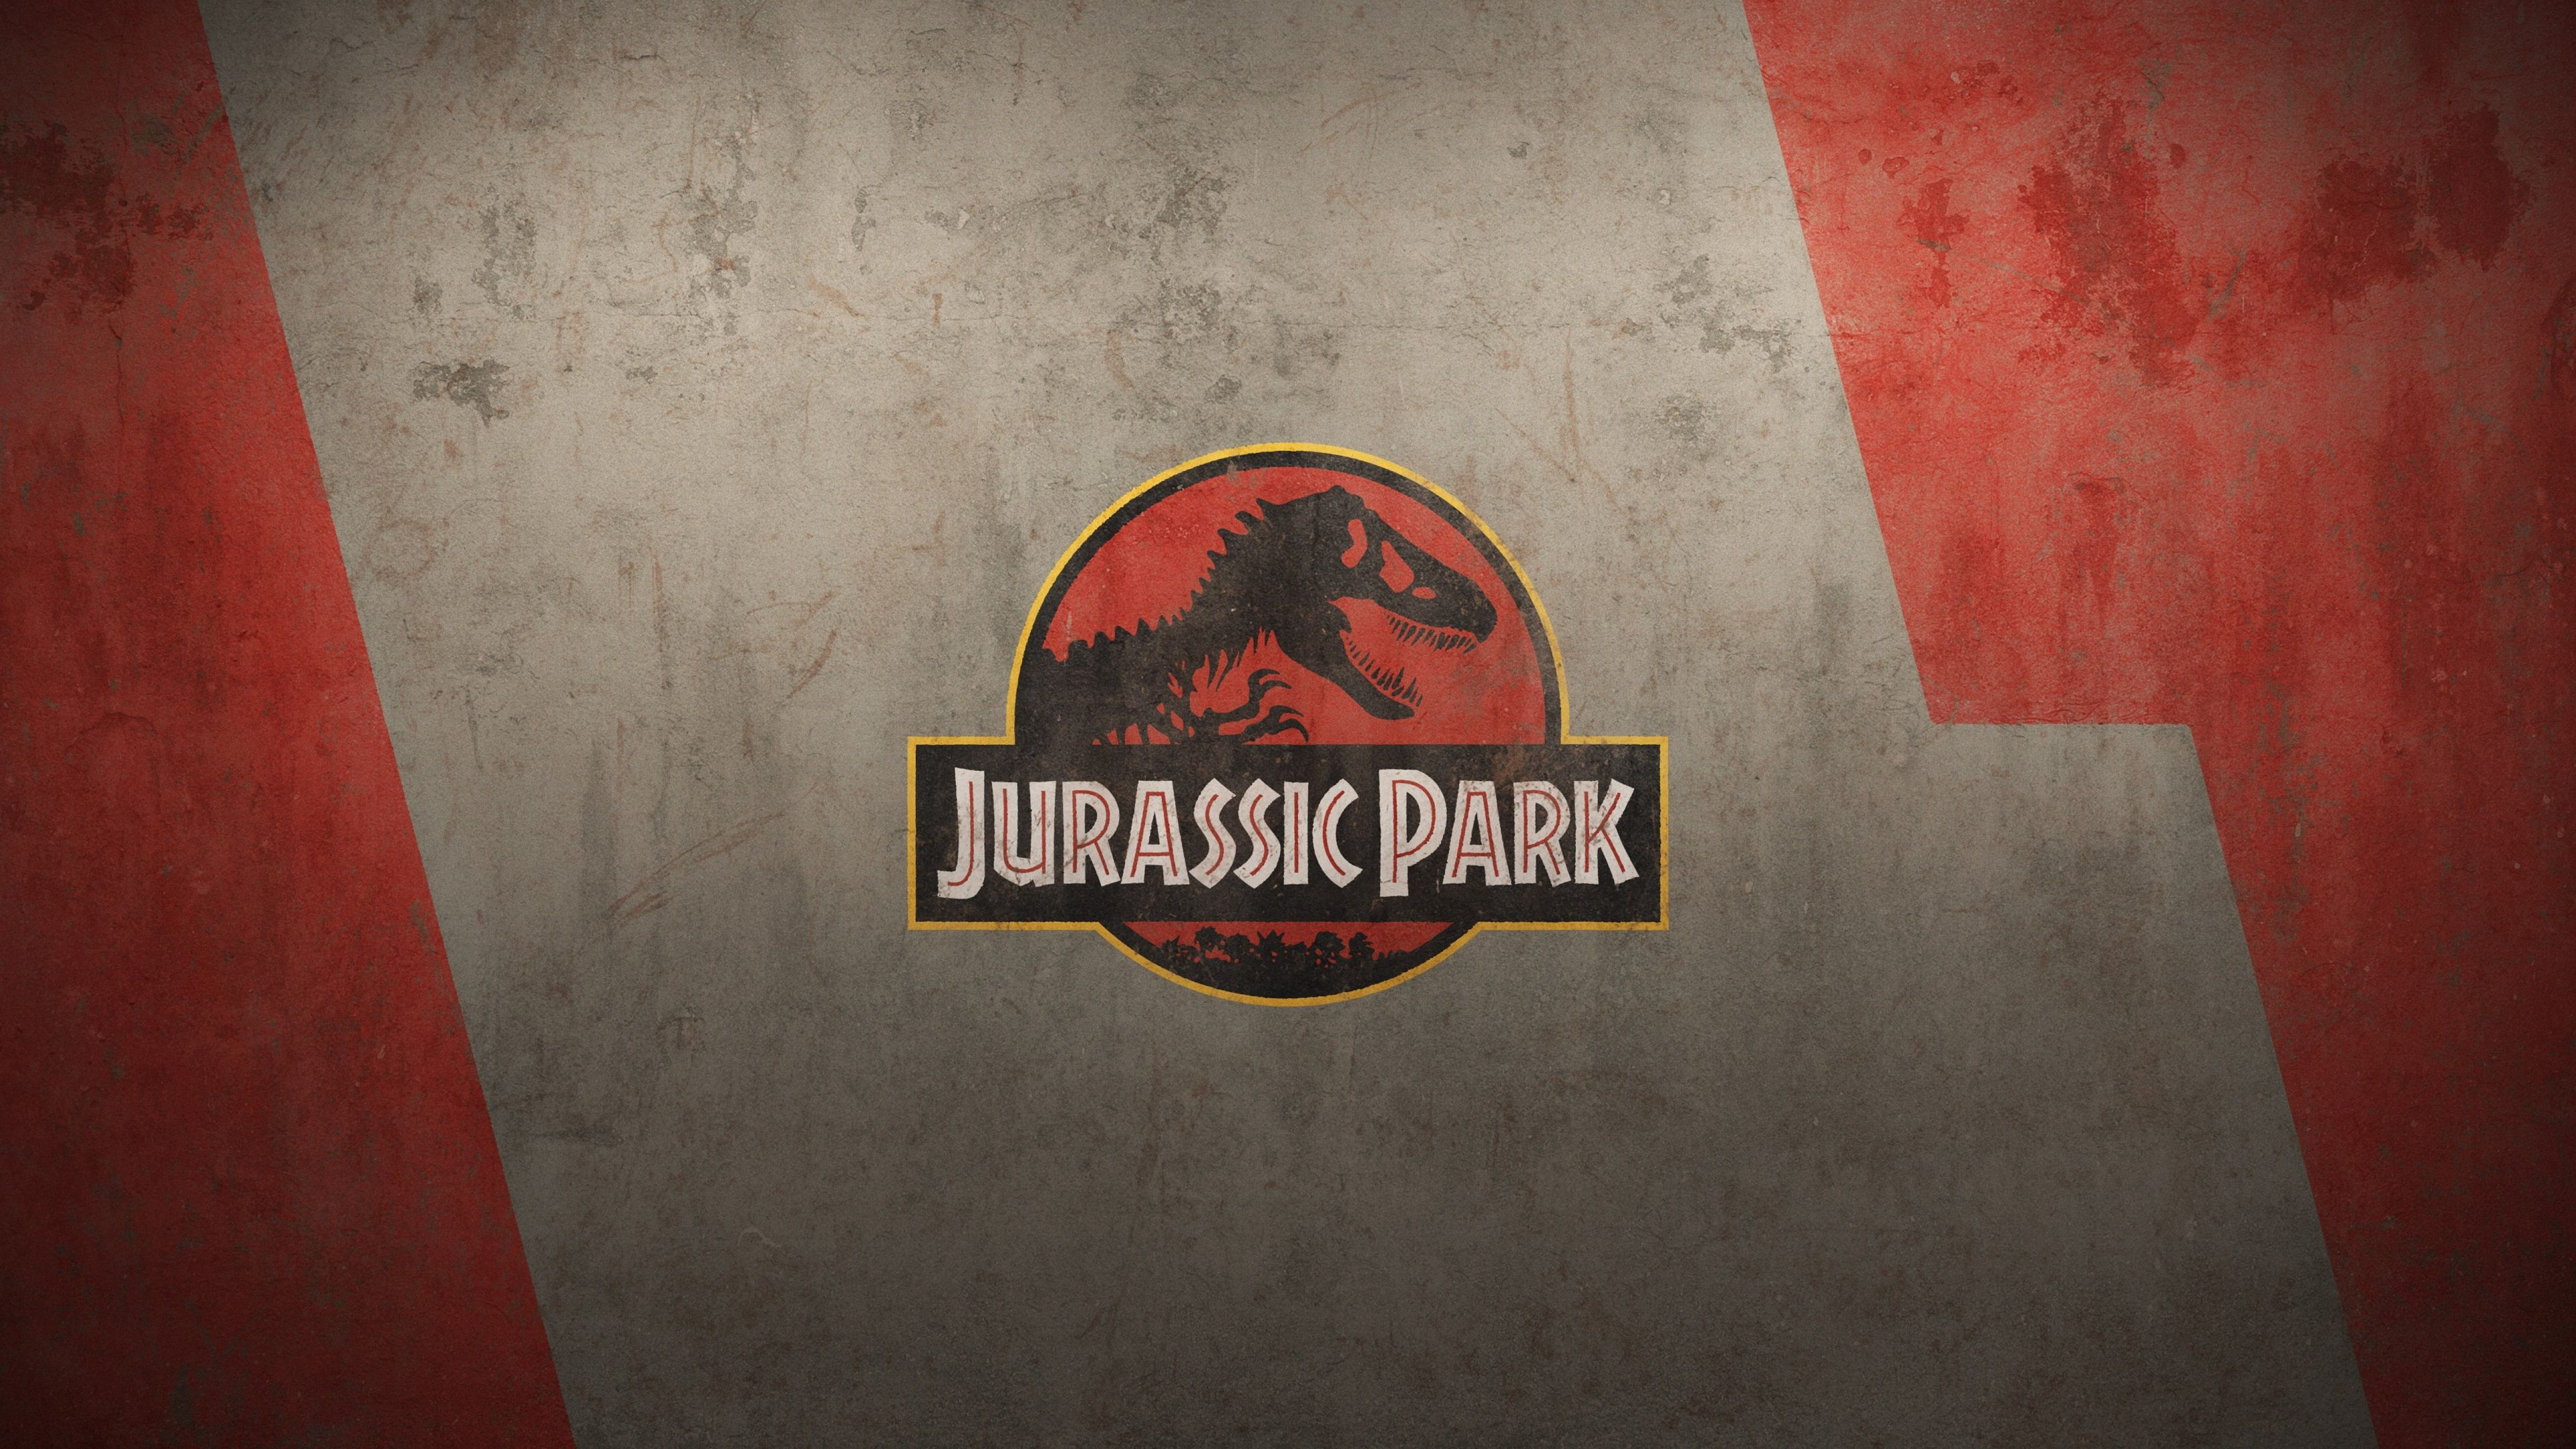 3840x2160 Jurassic Park 4k Wallpaper For Pc In Hd Jurassic World Wallpaper Jurassic Park World Wallpaper